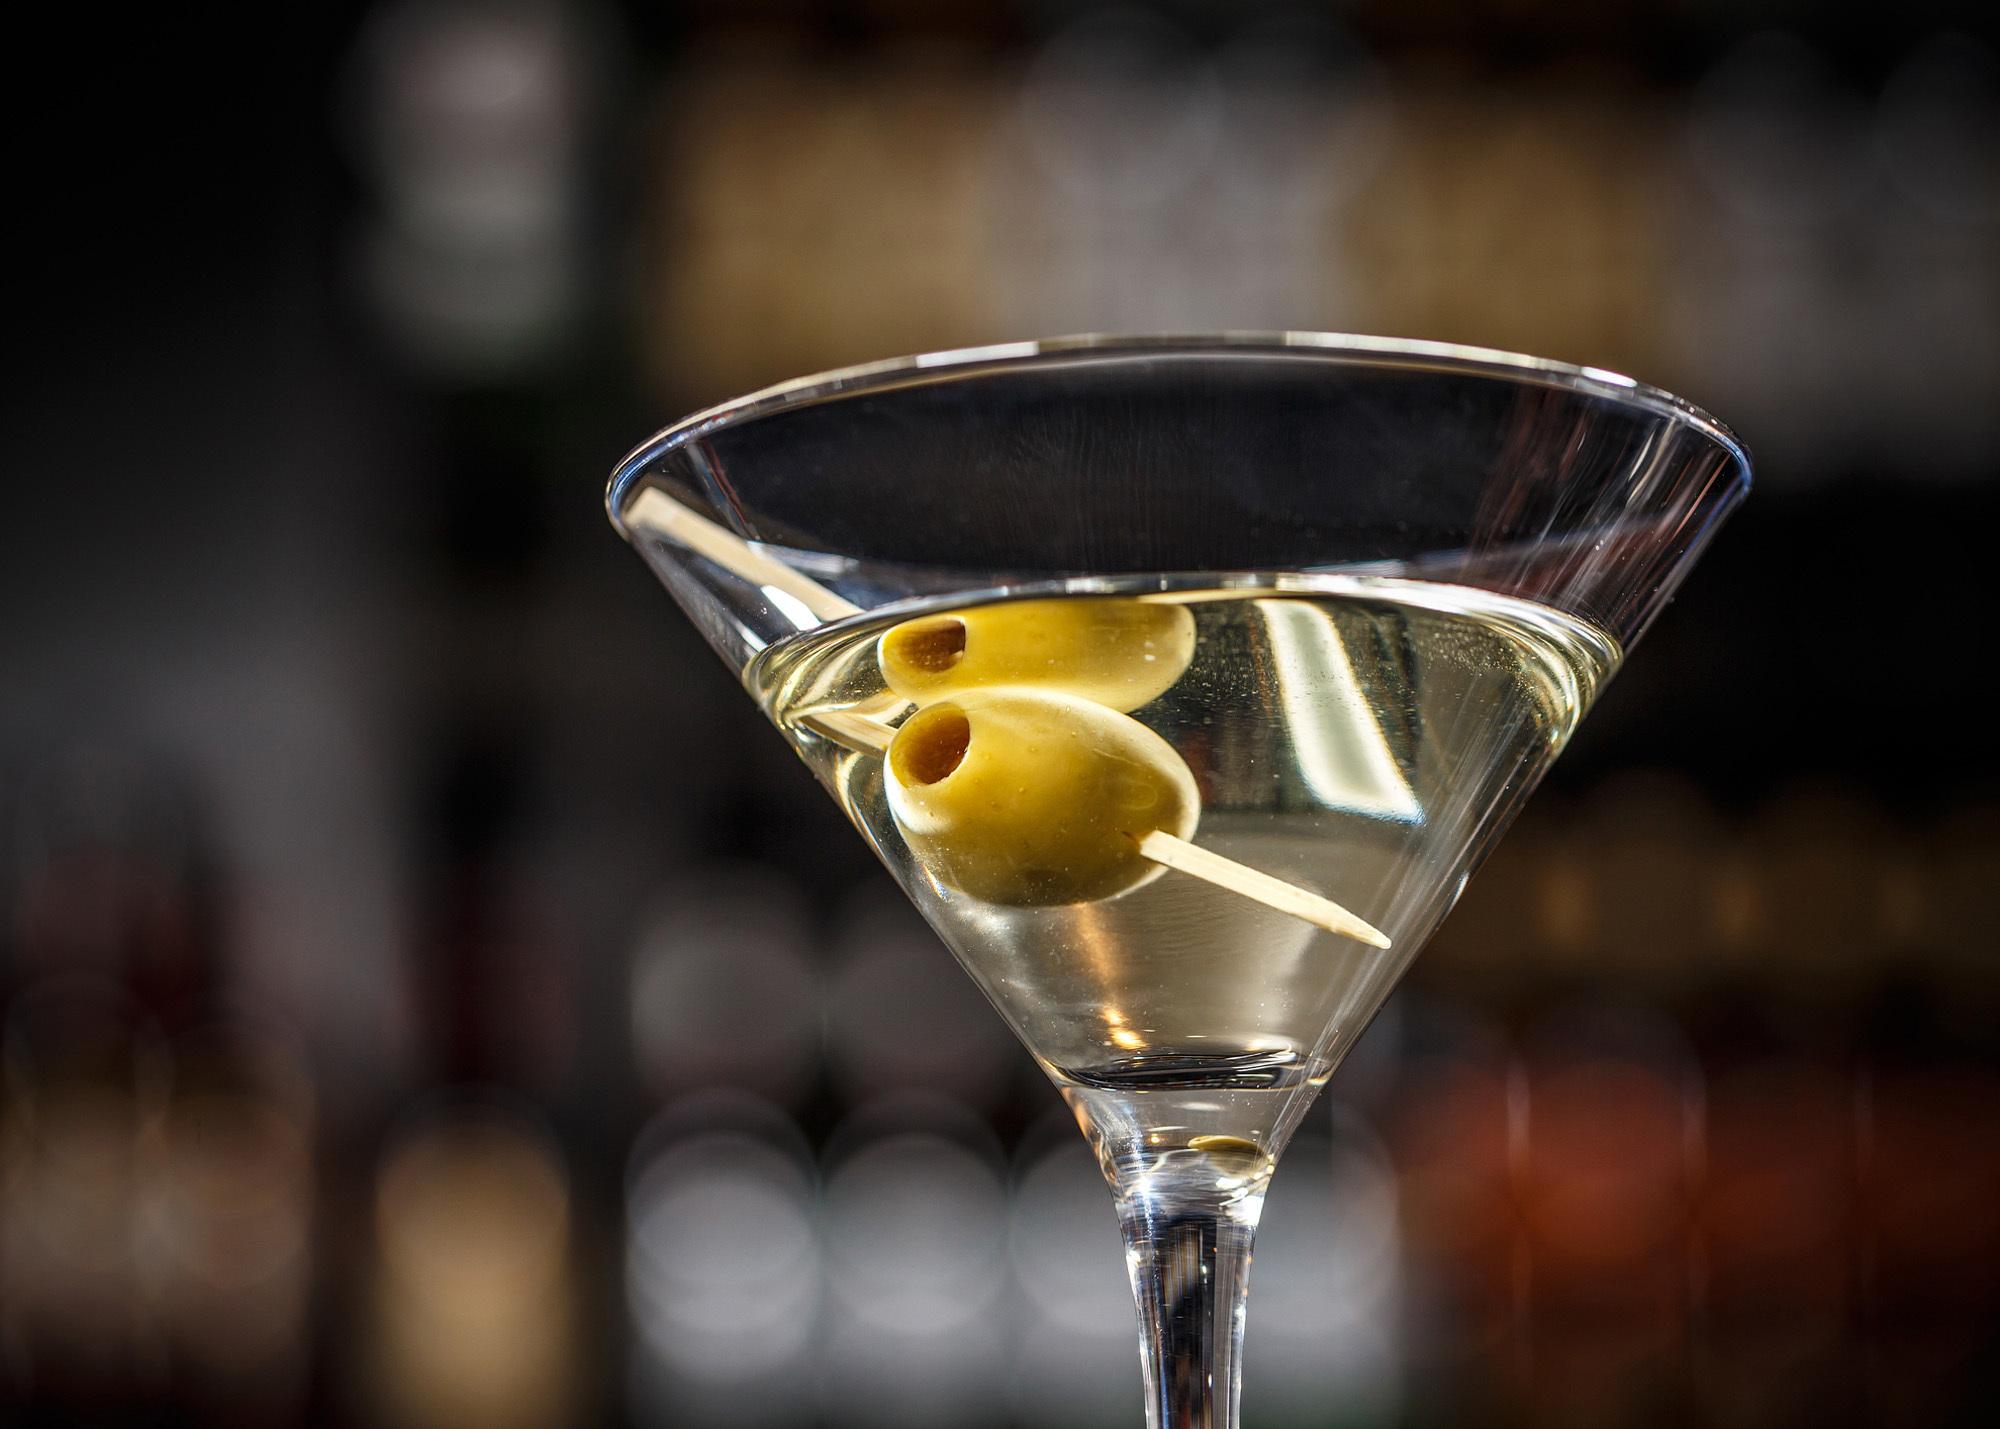 martini-drink.jpg?mtime=20190327090942#asset:105343